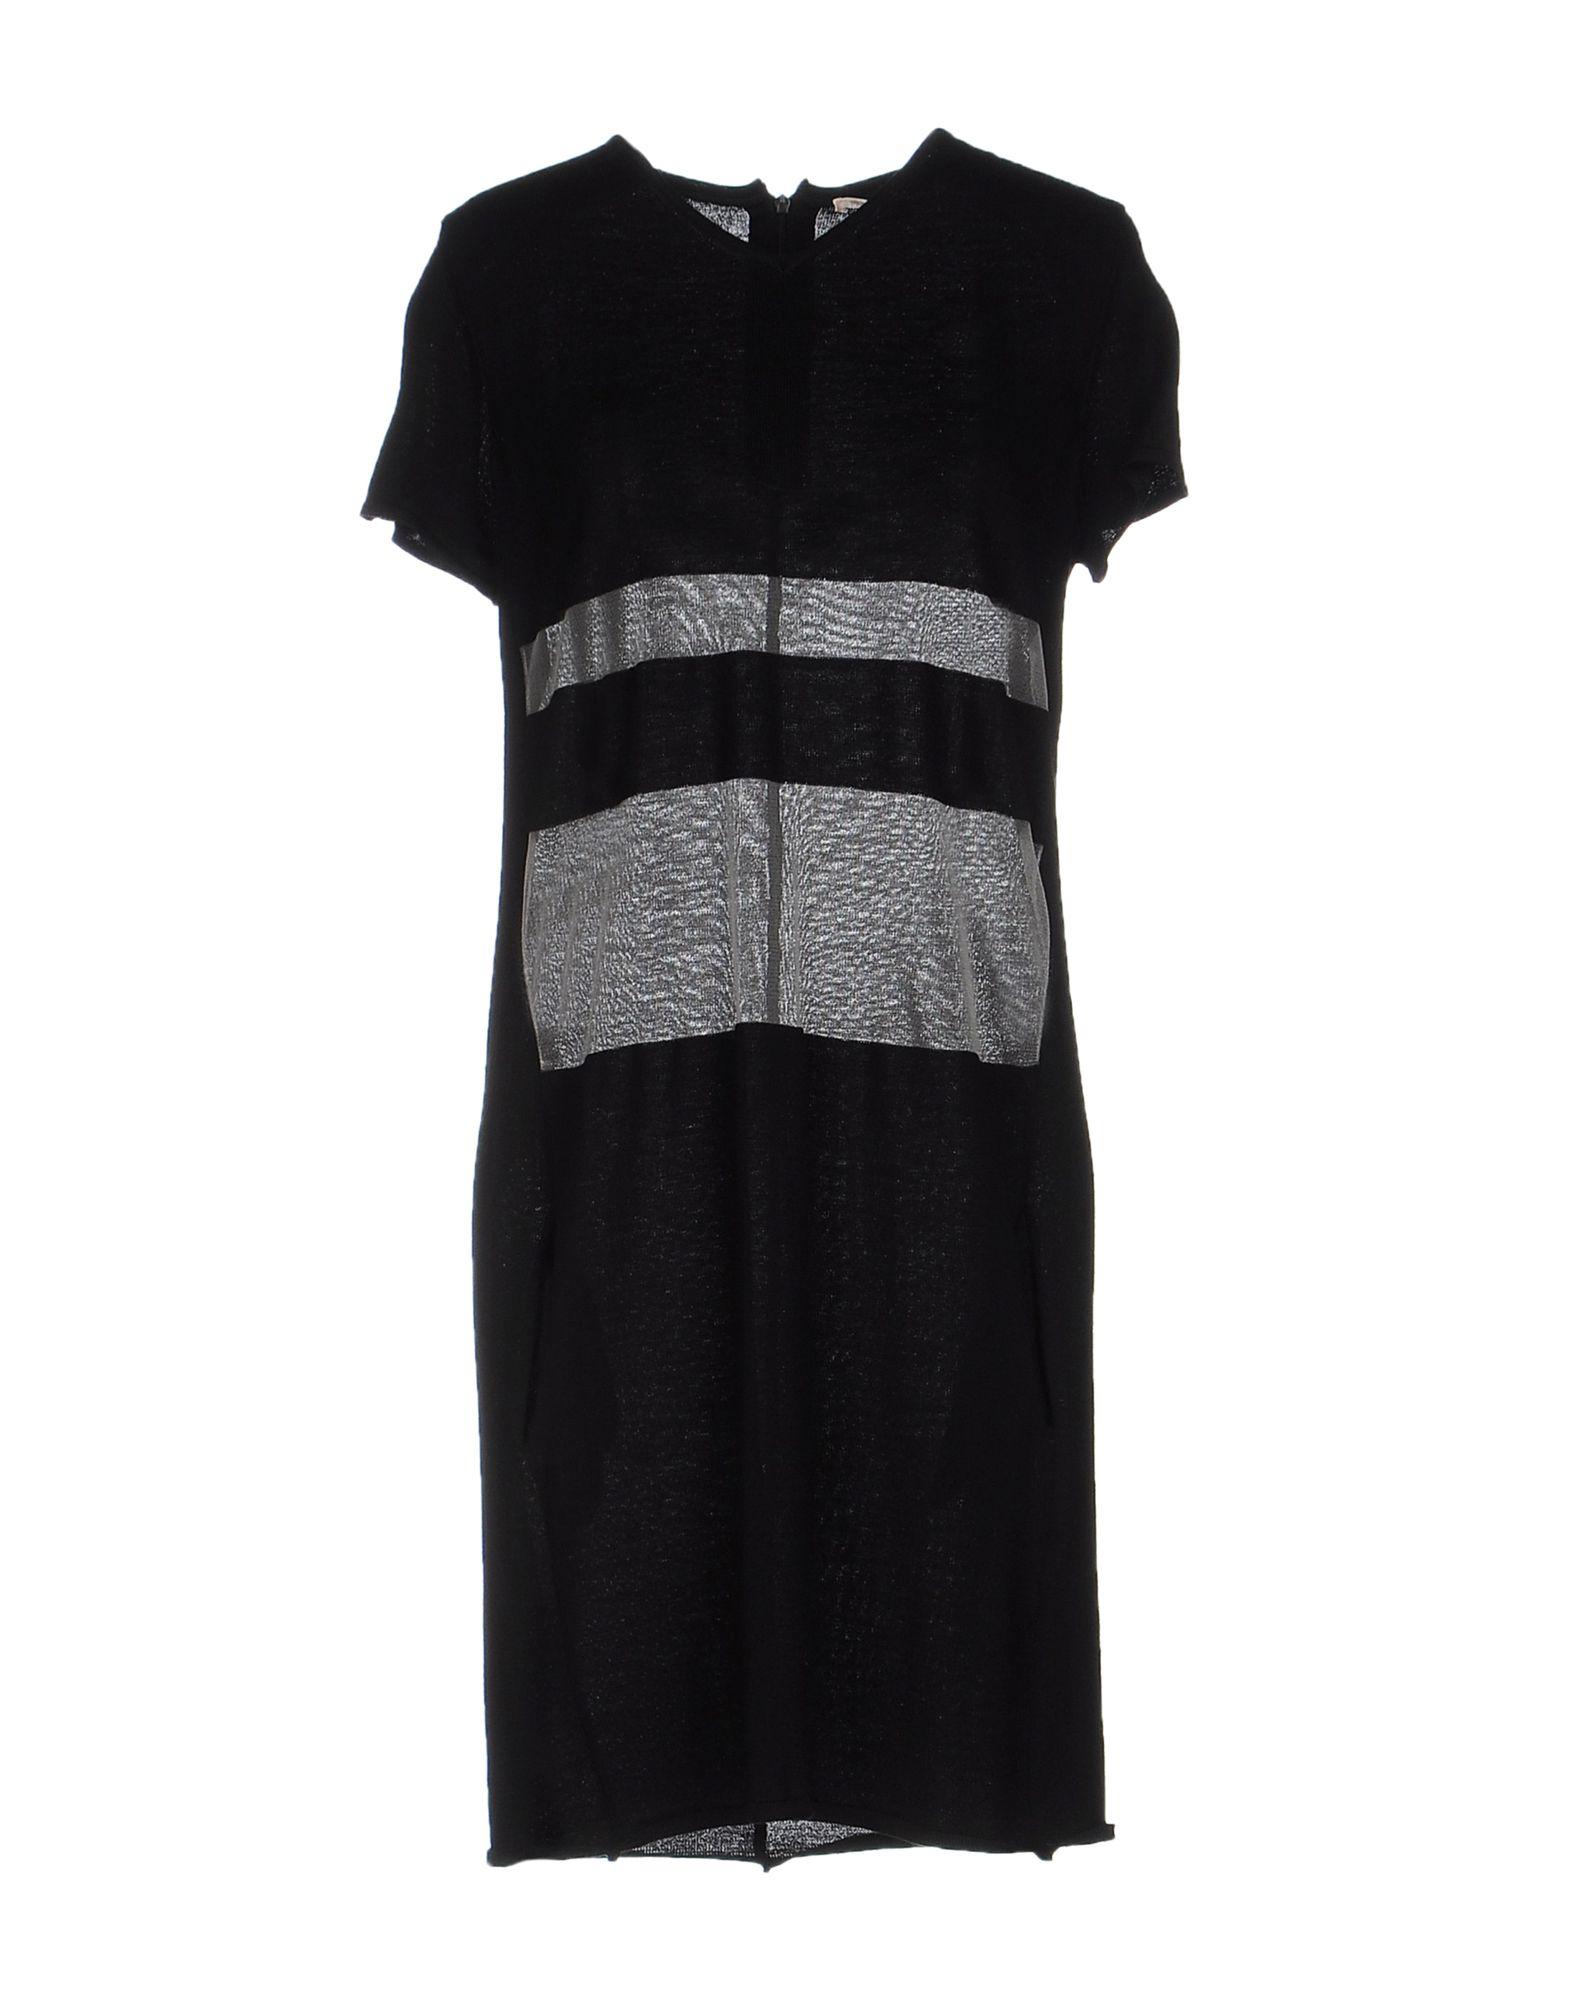 PAOLO PECORA DONNA Короткое платье paolo petrone короткое платье